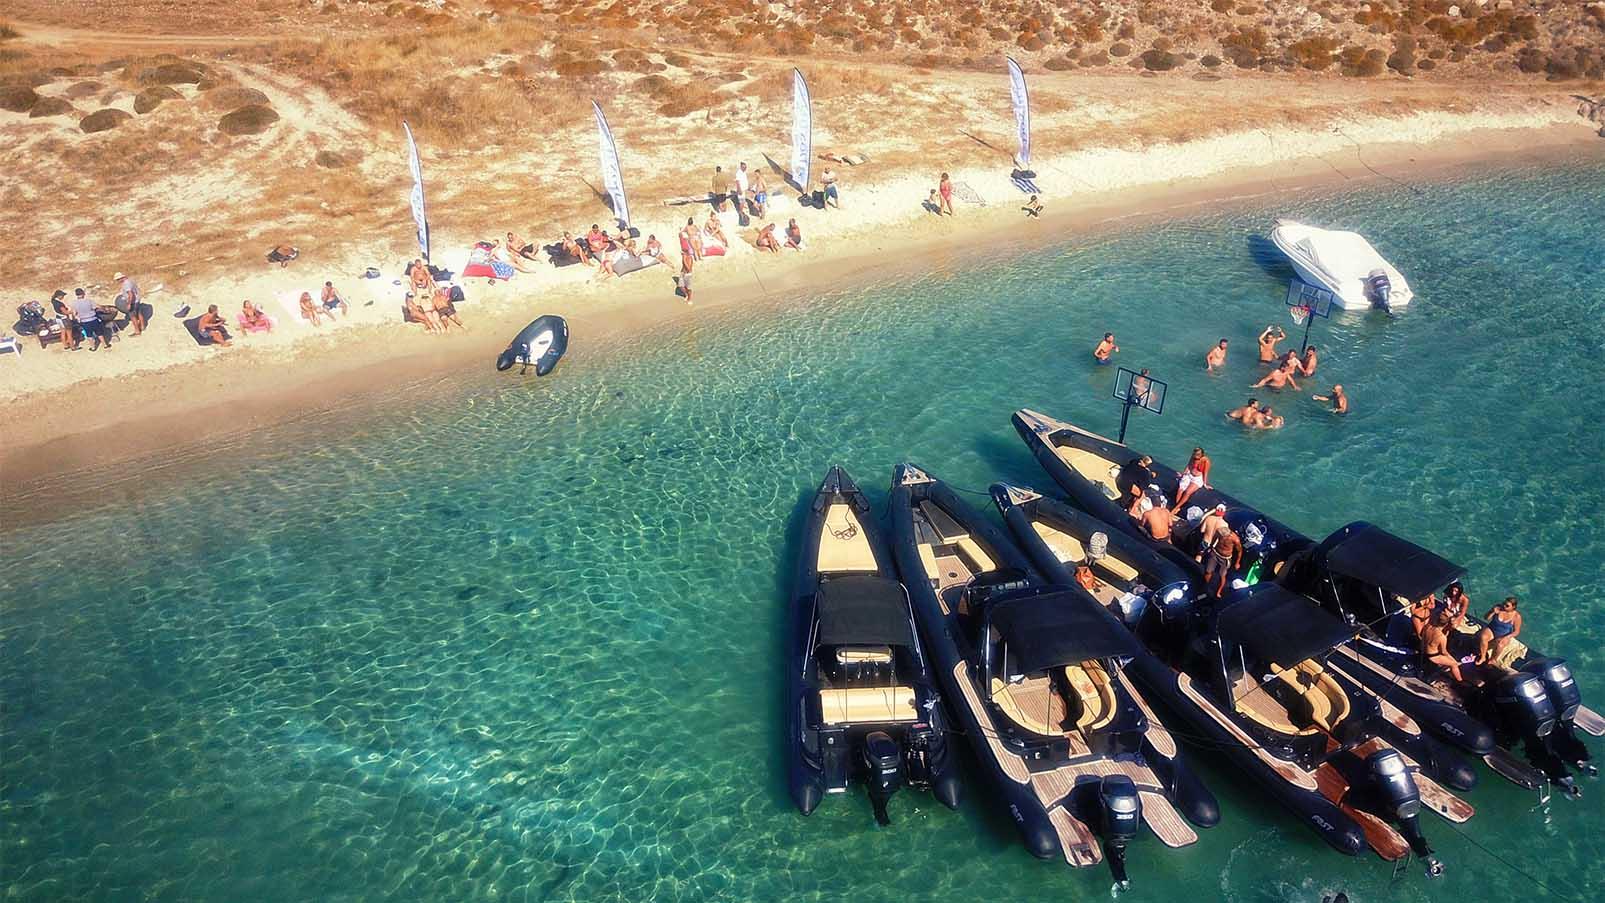 Mykonos - Paros - Private day cruise | Don Blue RIB boat rental